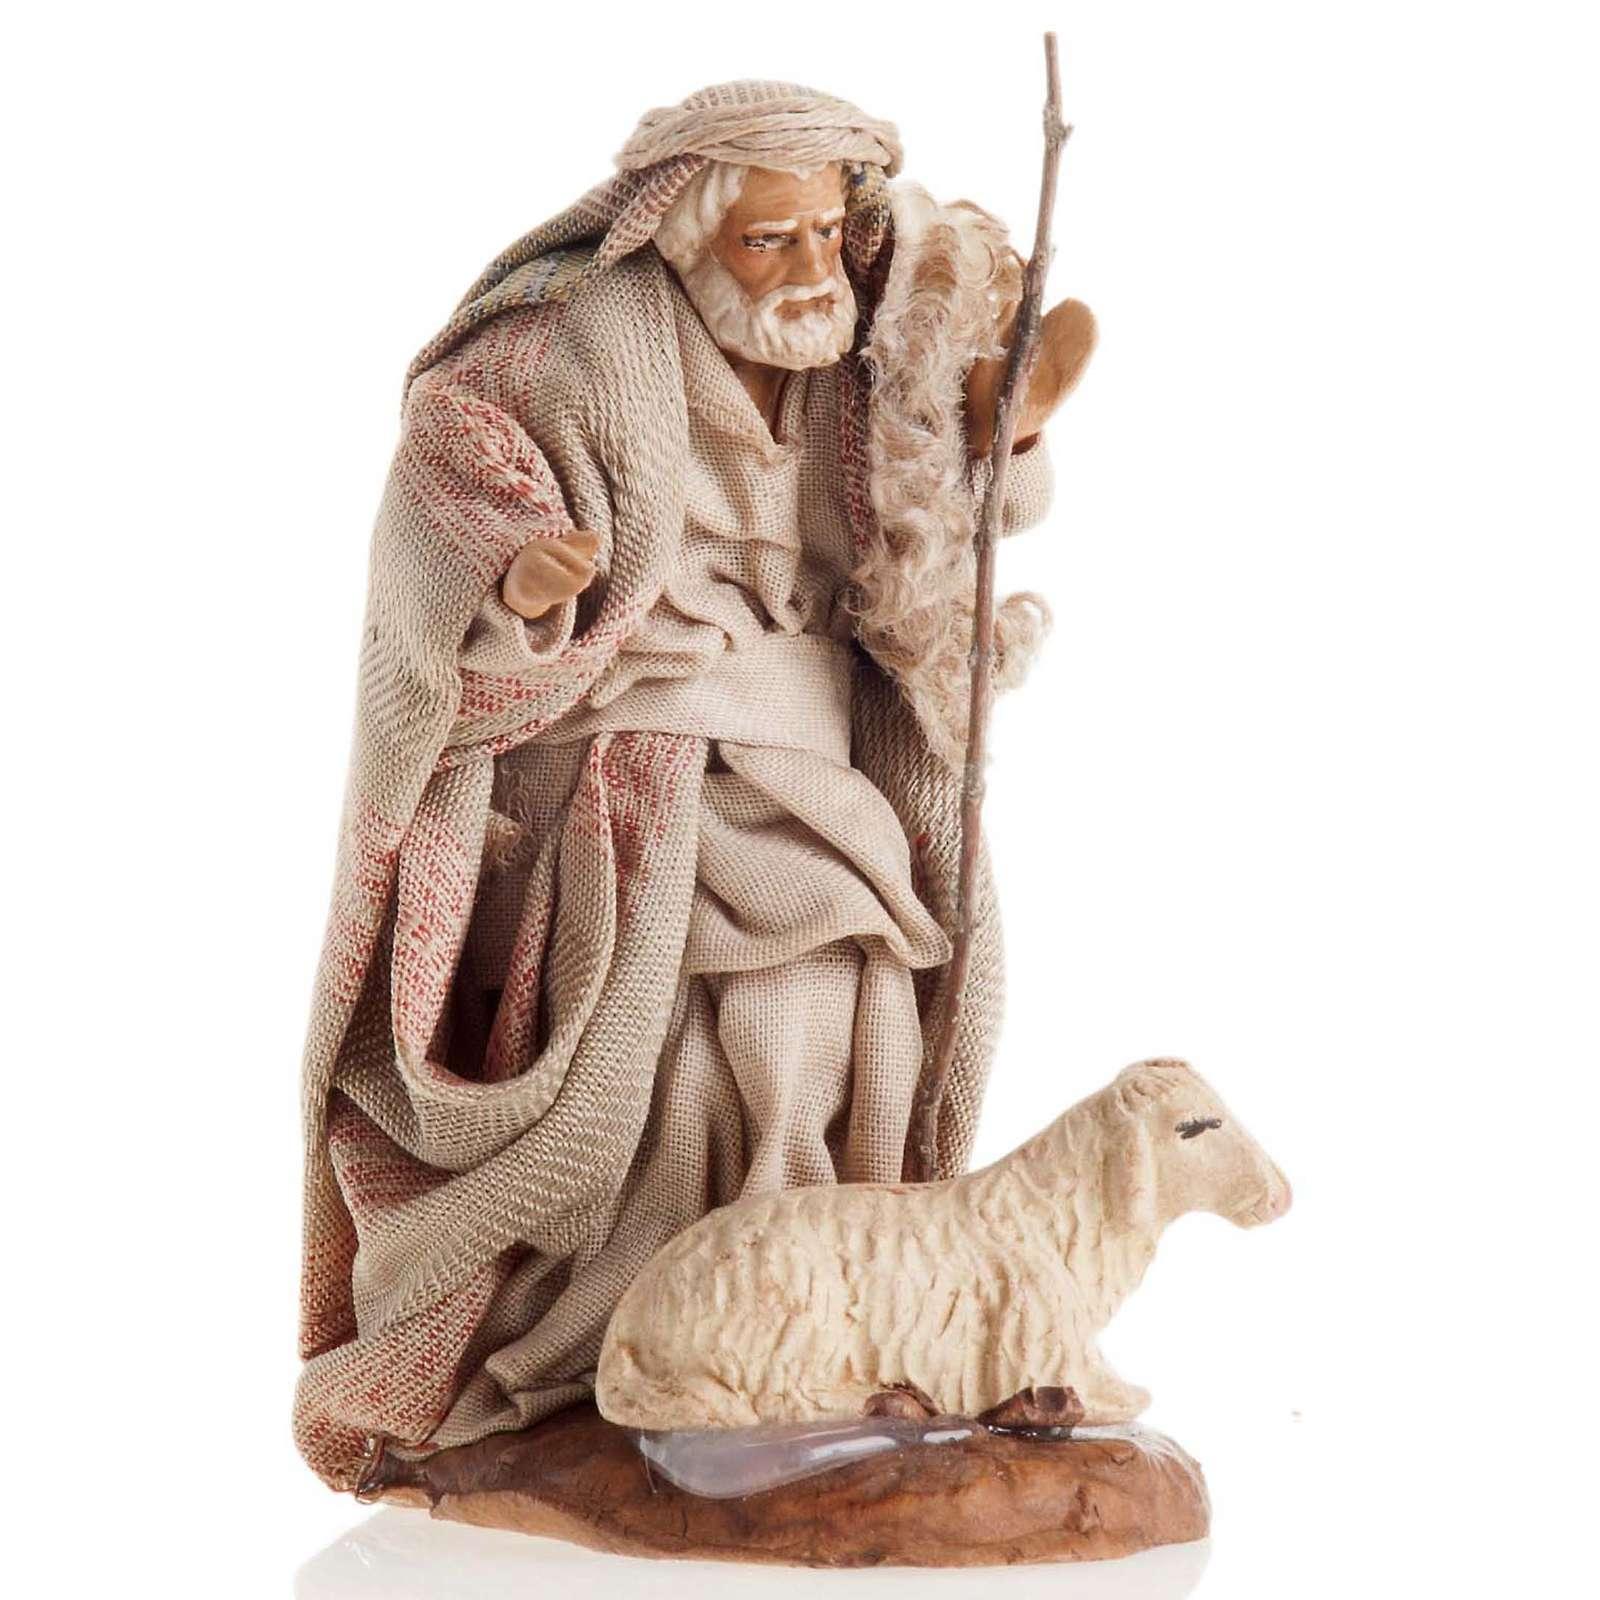 Neapolitan Nativity figurine, Old man with sheep 8cm 4